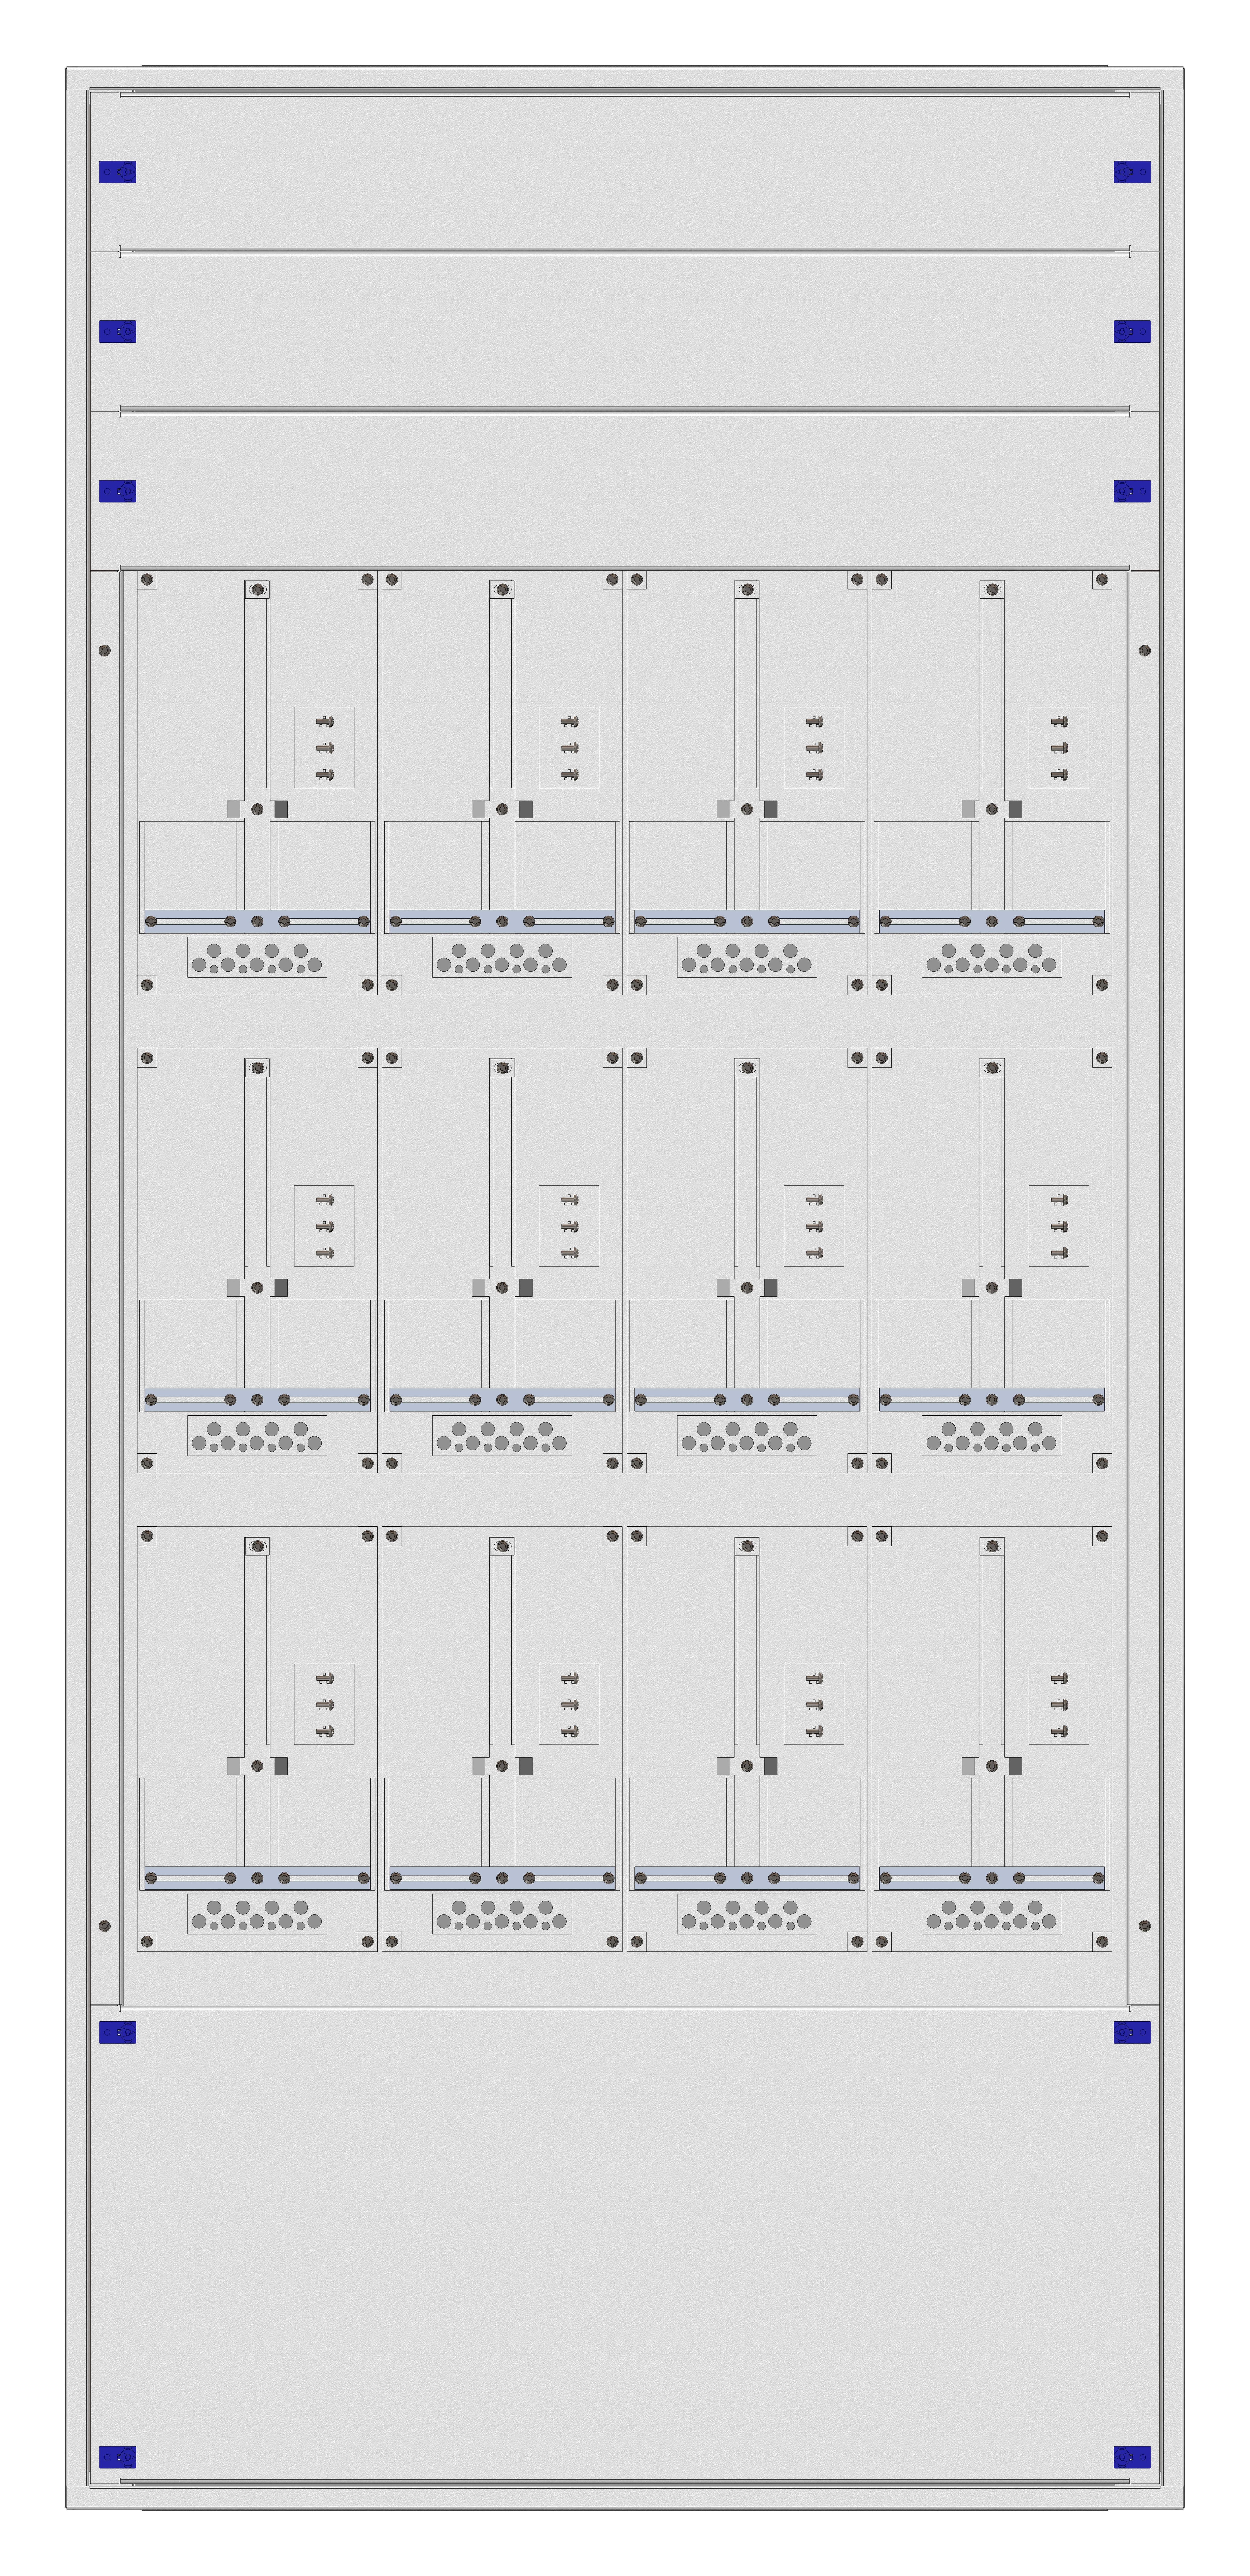 1 Stk Masken-Zählerverteiler 4M-45O/KTN 12ZP, H2130B980T200mm IL122445KK